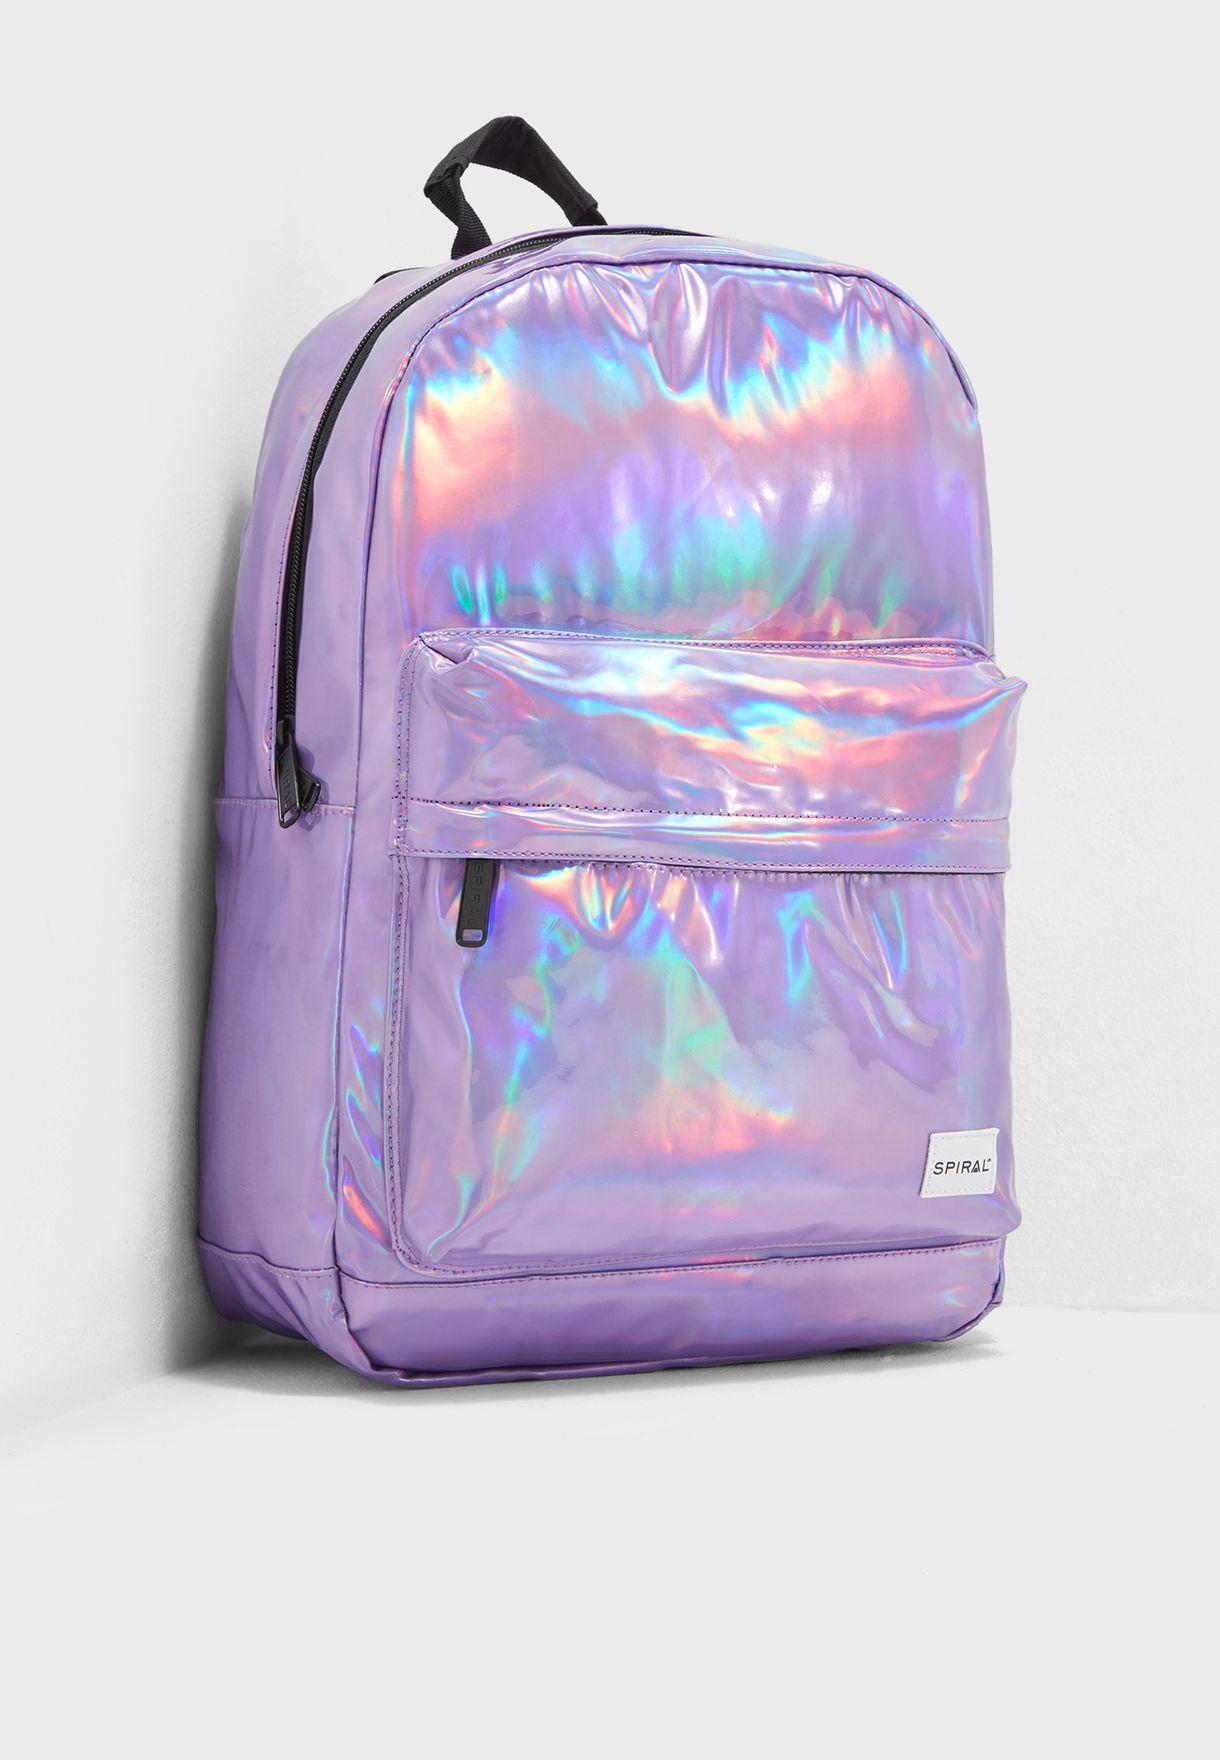 Rave Backpack